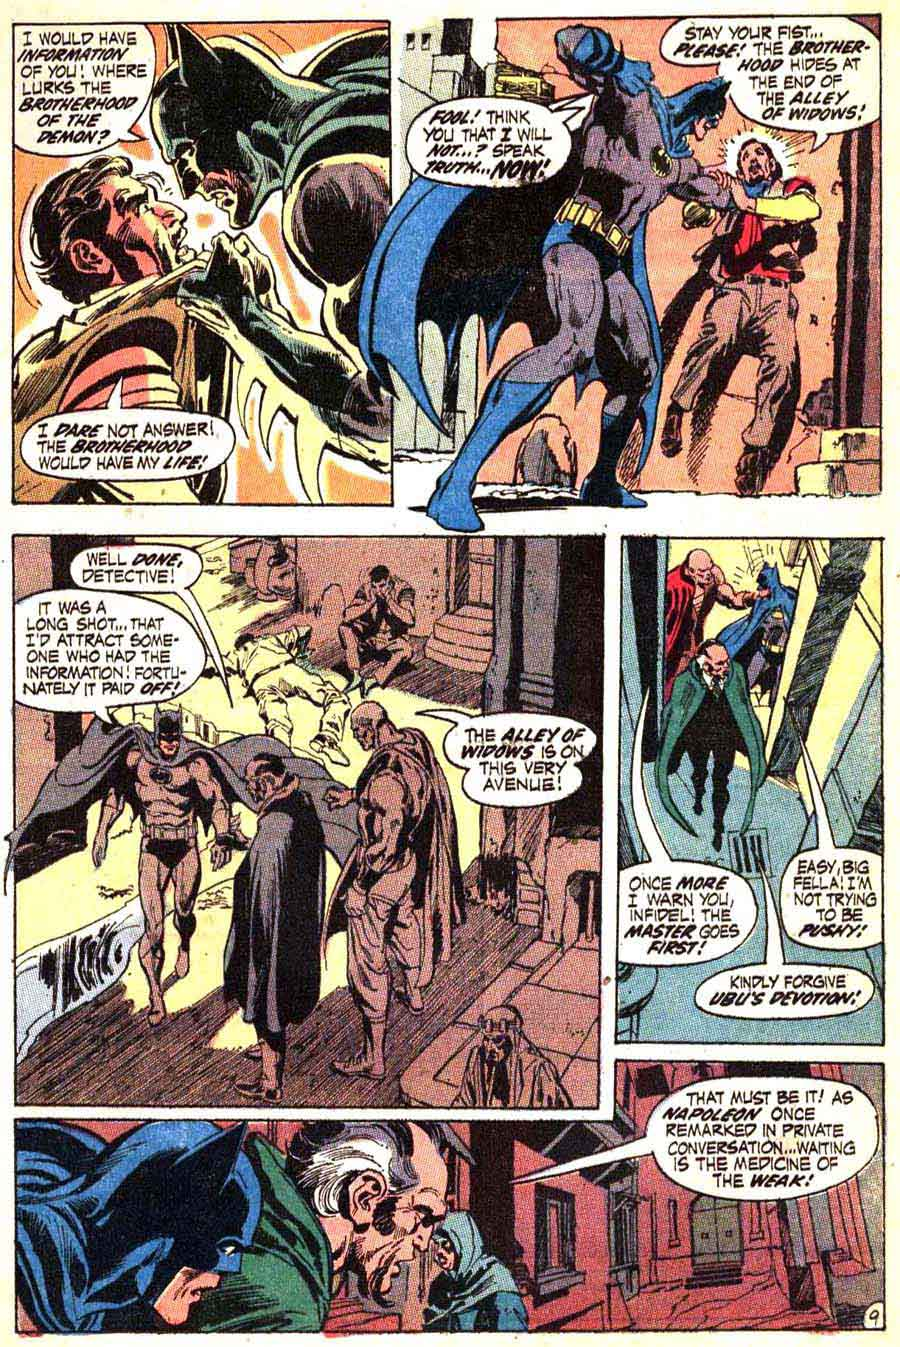 Batman v1 #232 dc comic book page art by Neal Adams